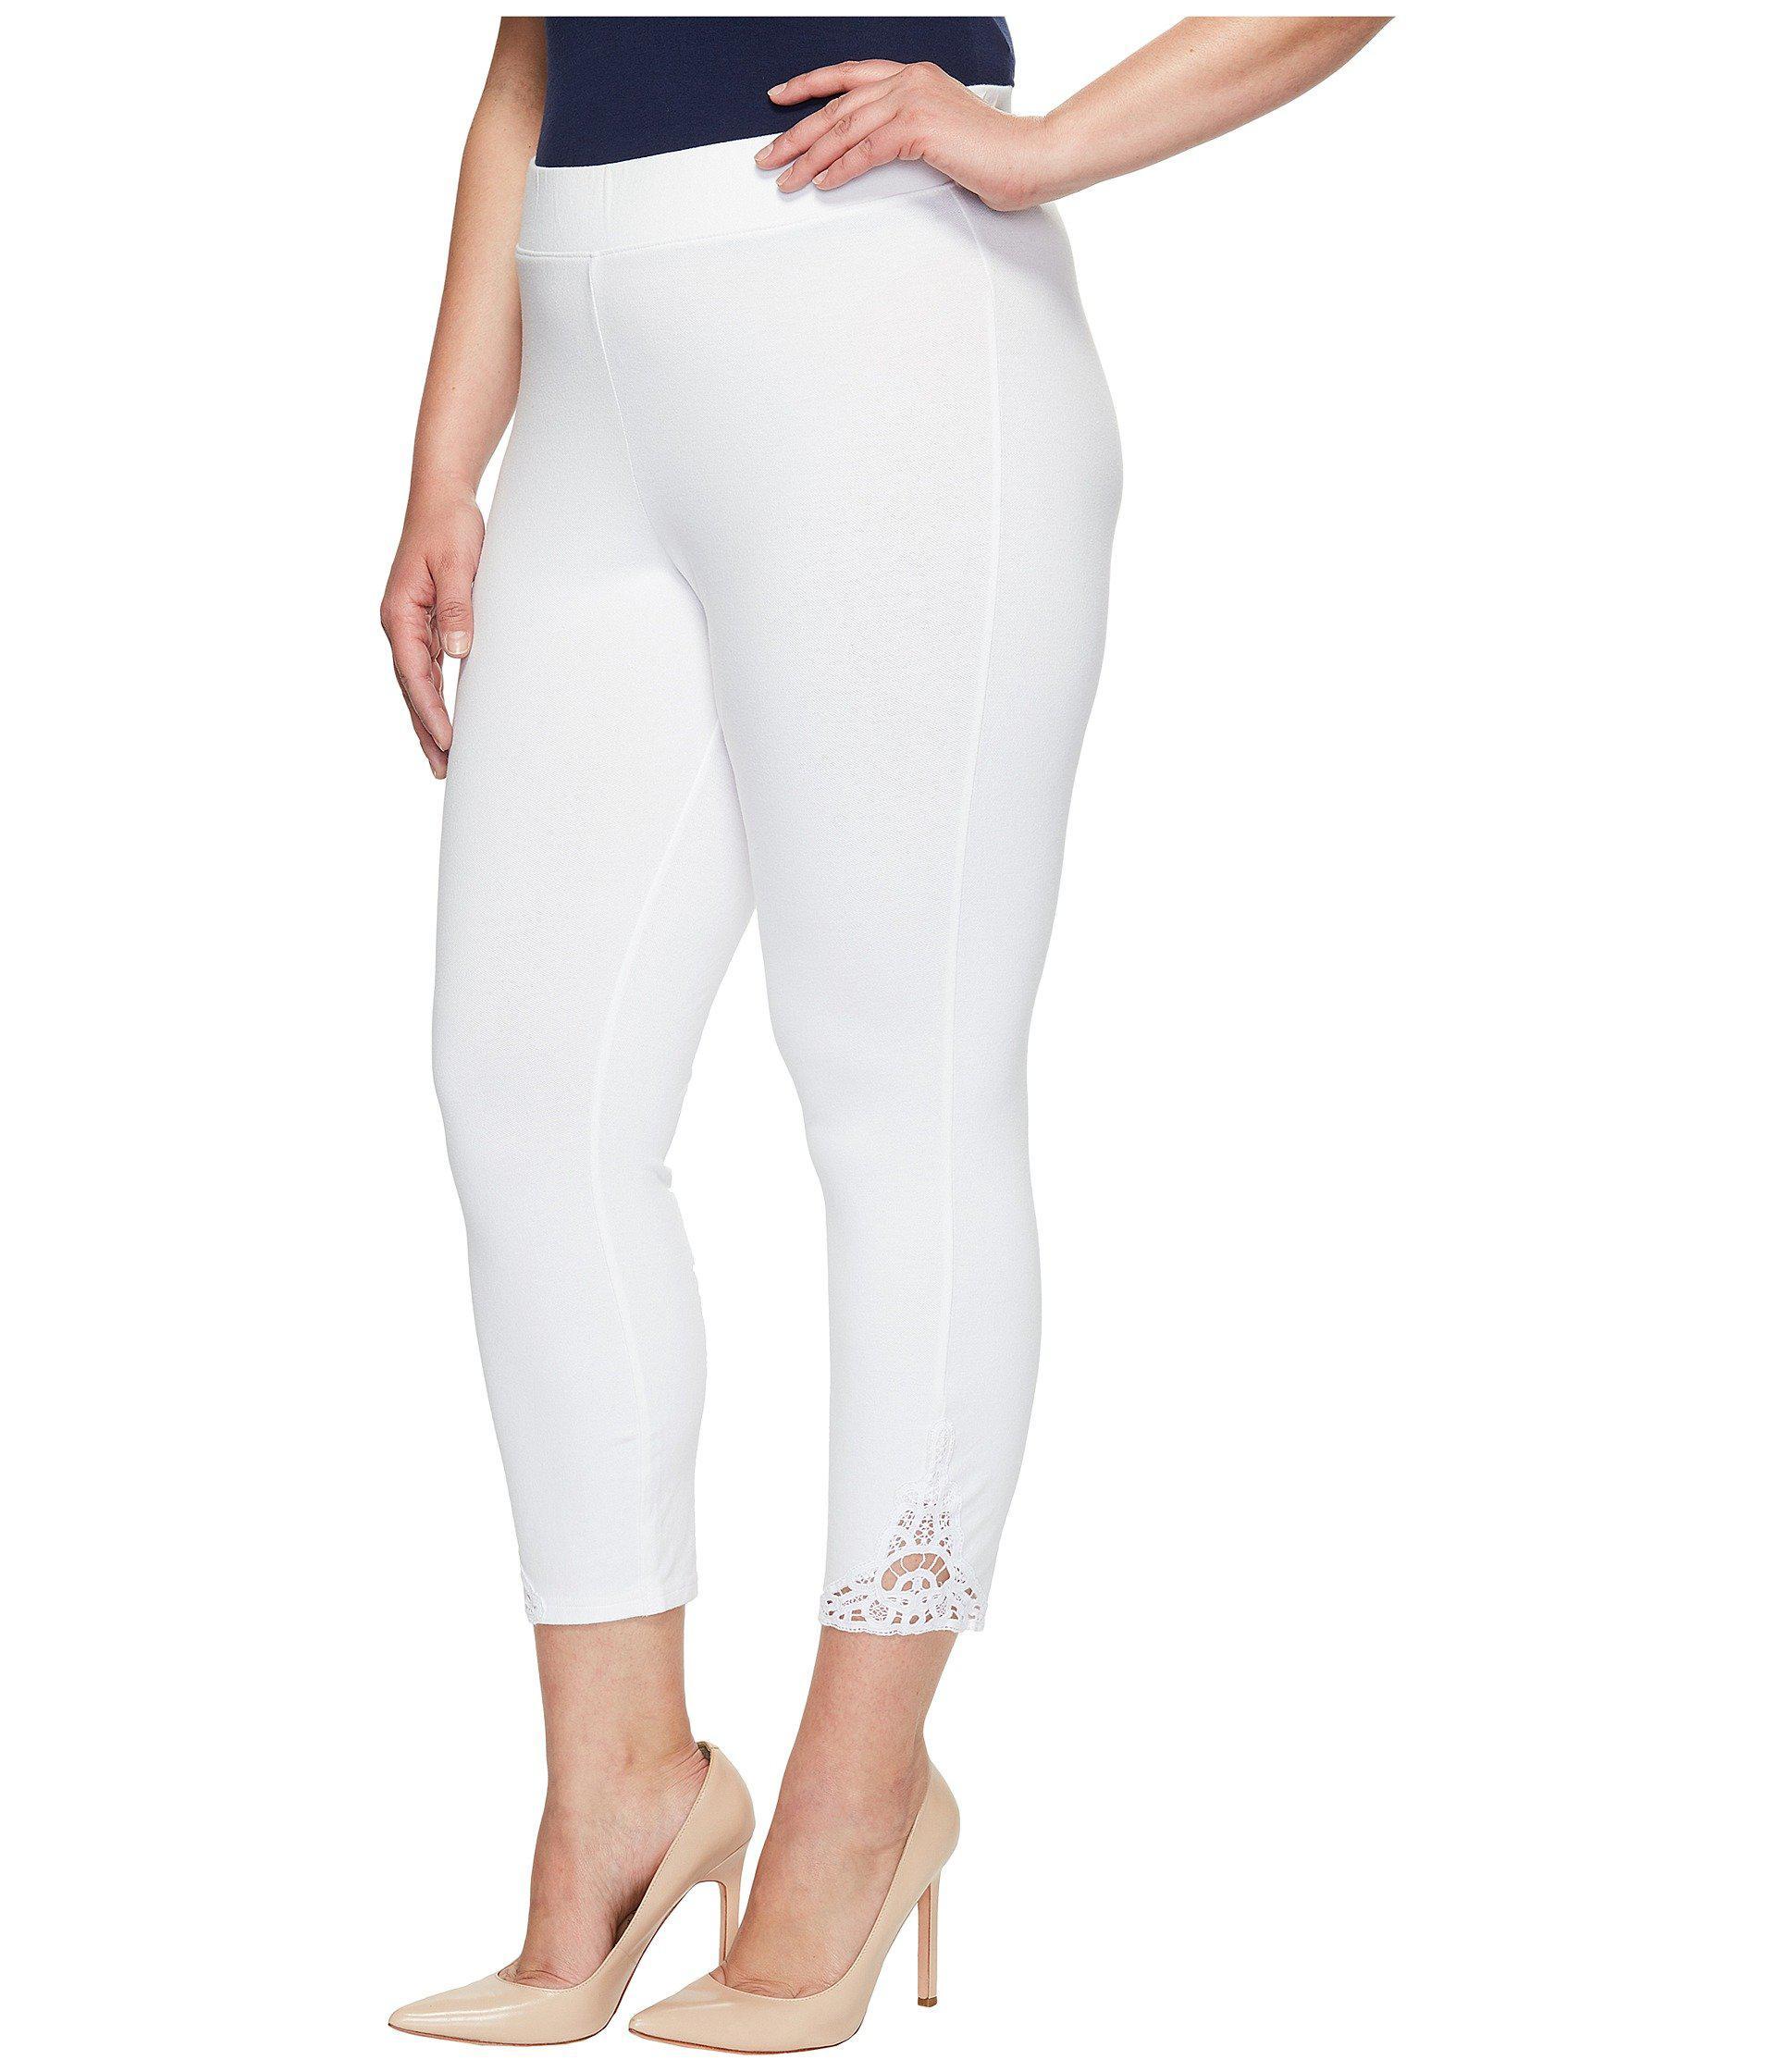 1a38149893adb0 Hue Plus Size Wide Waistband Lace Trim Pique Capris in White - Lyst